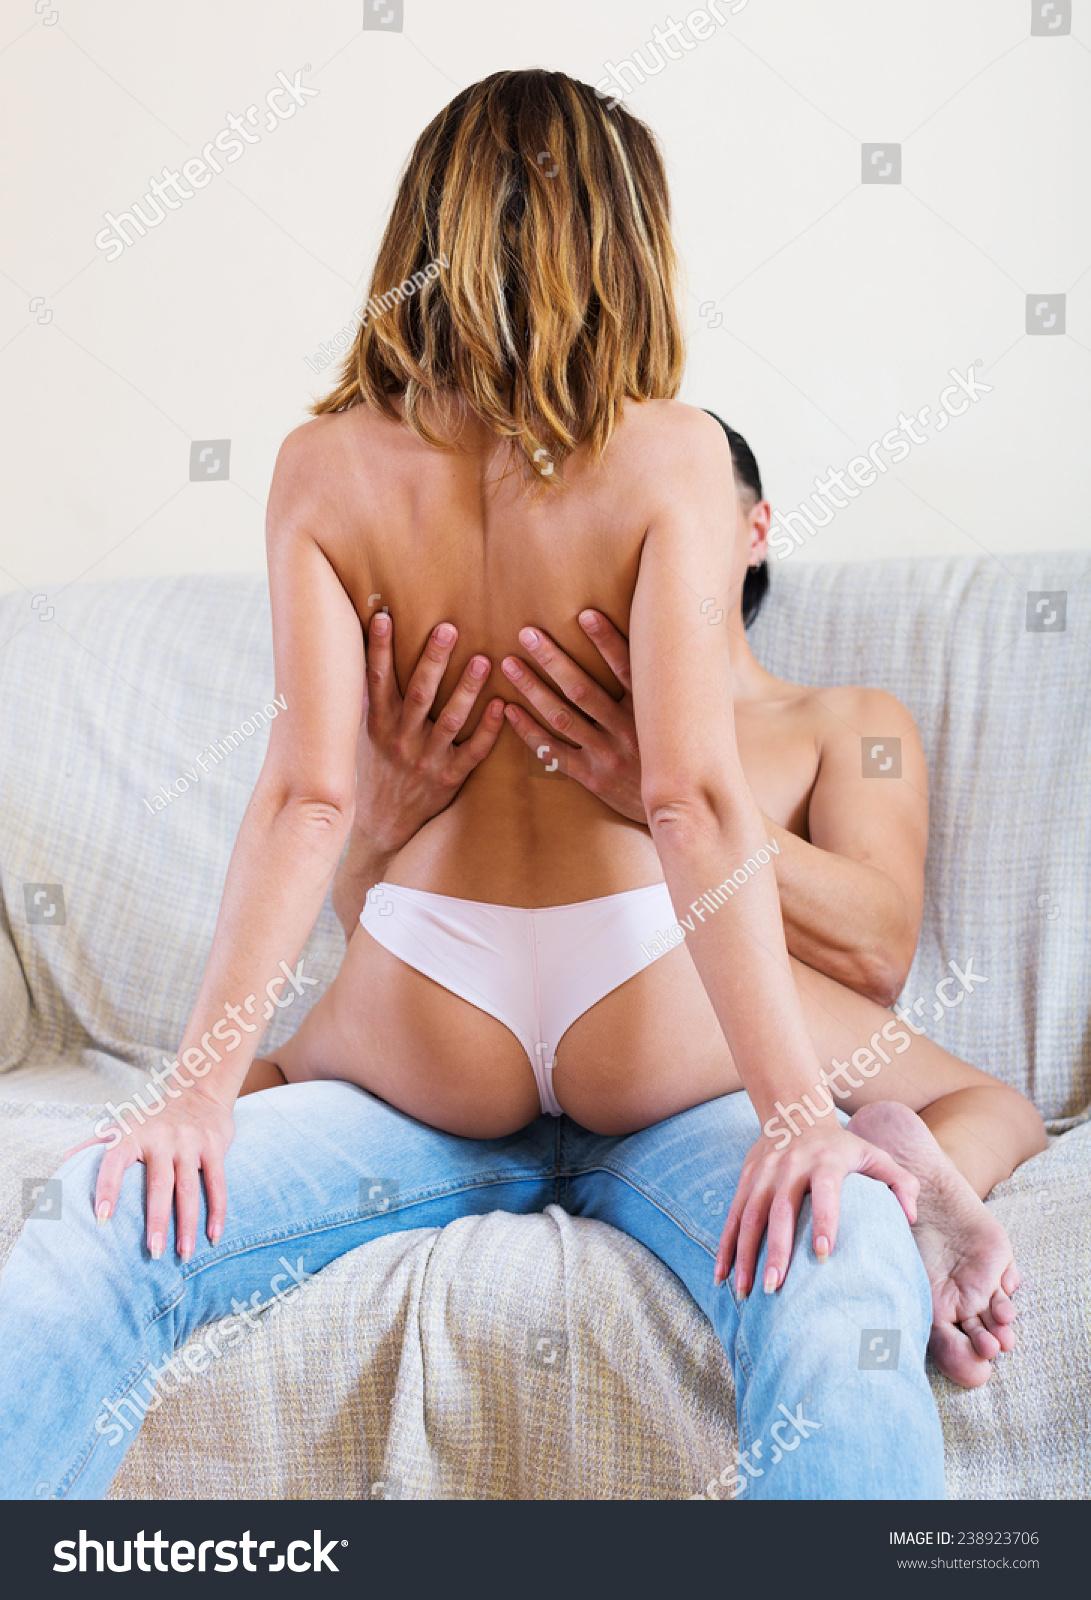 Sexy nude woman sex